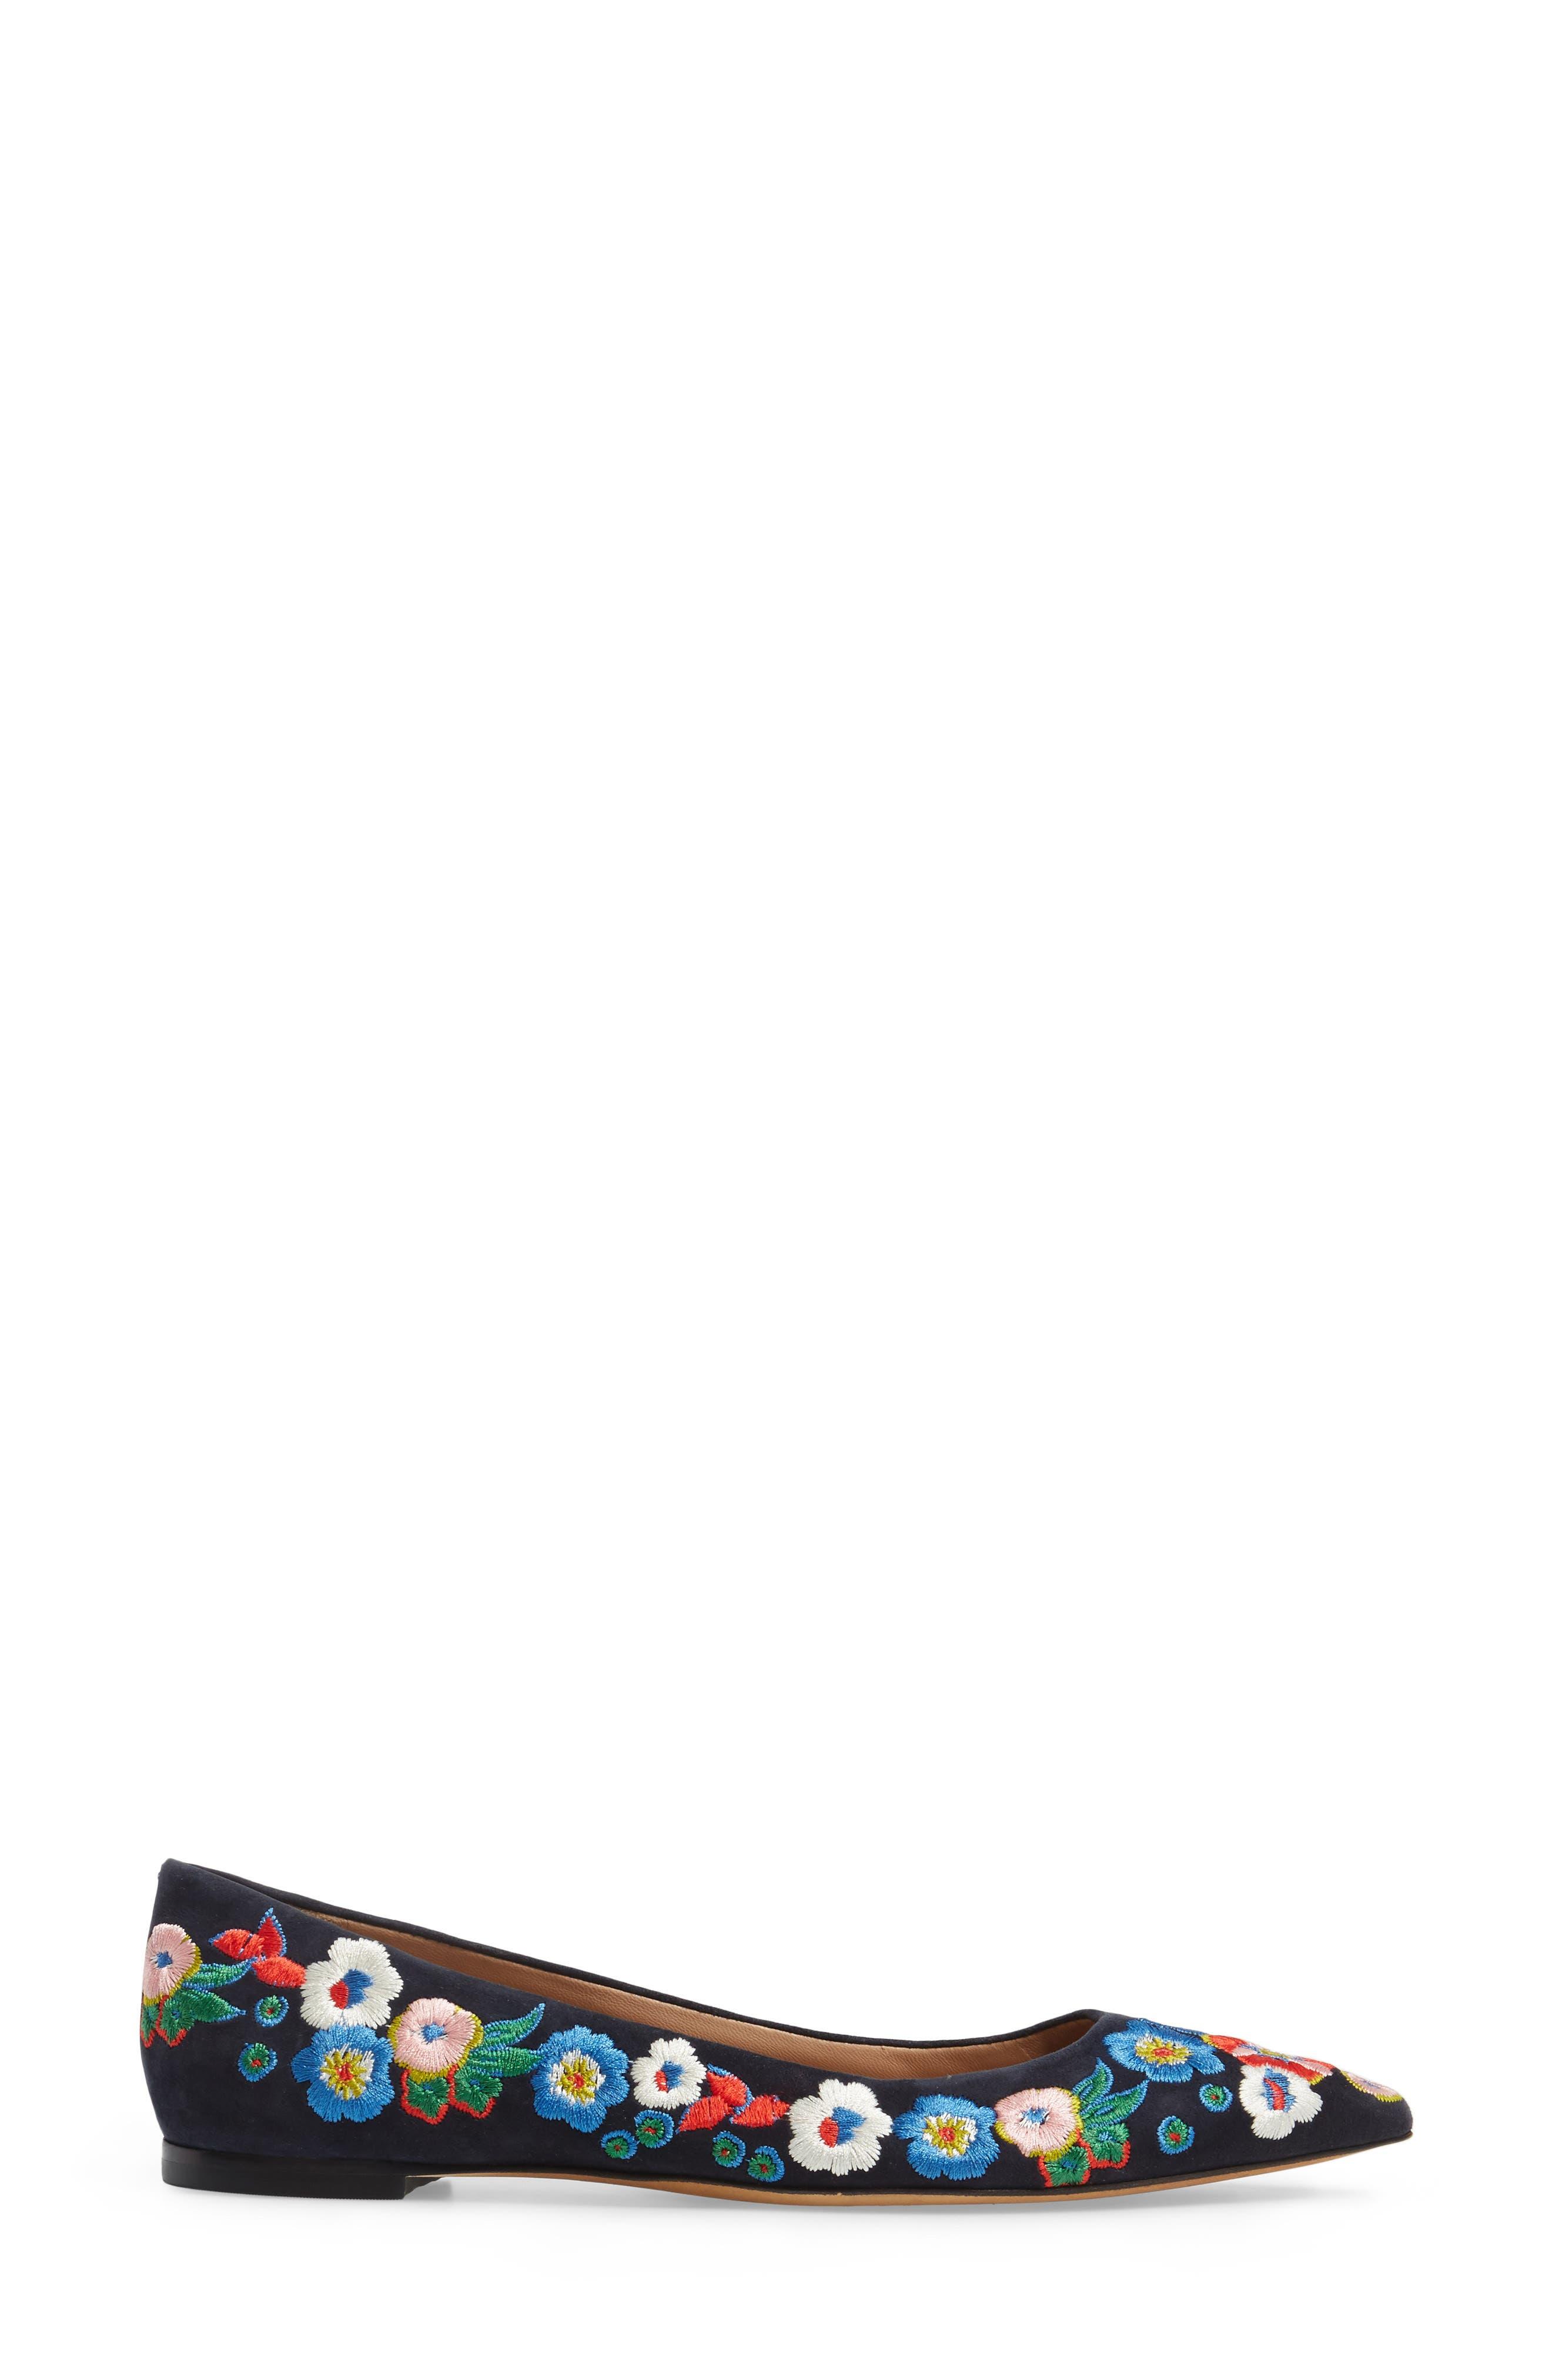 Alternate Image 3  - Tory Burch Rosemont Flower Embroidered Flat (Women)